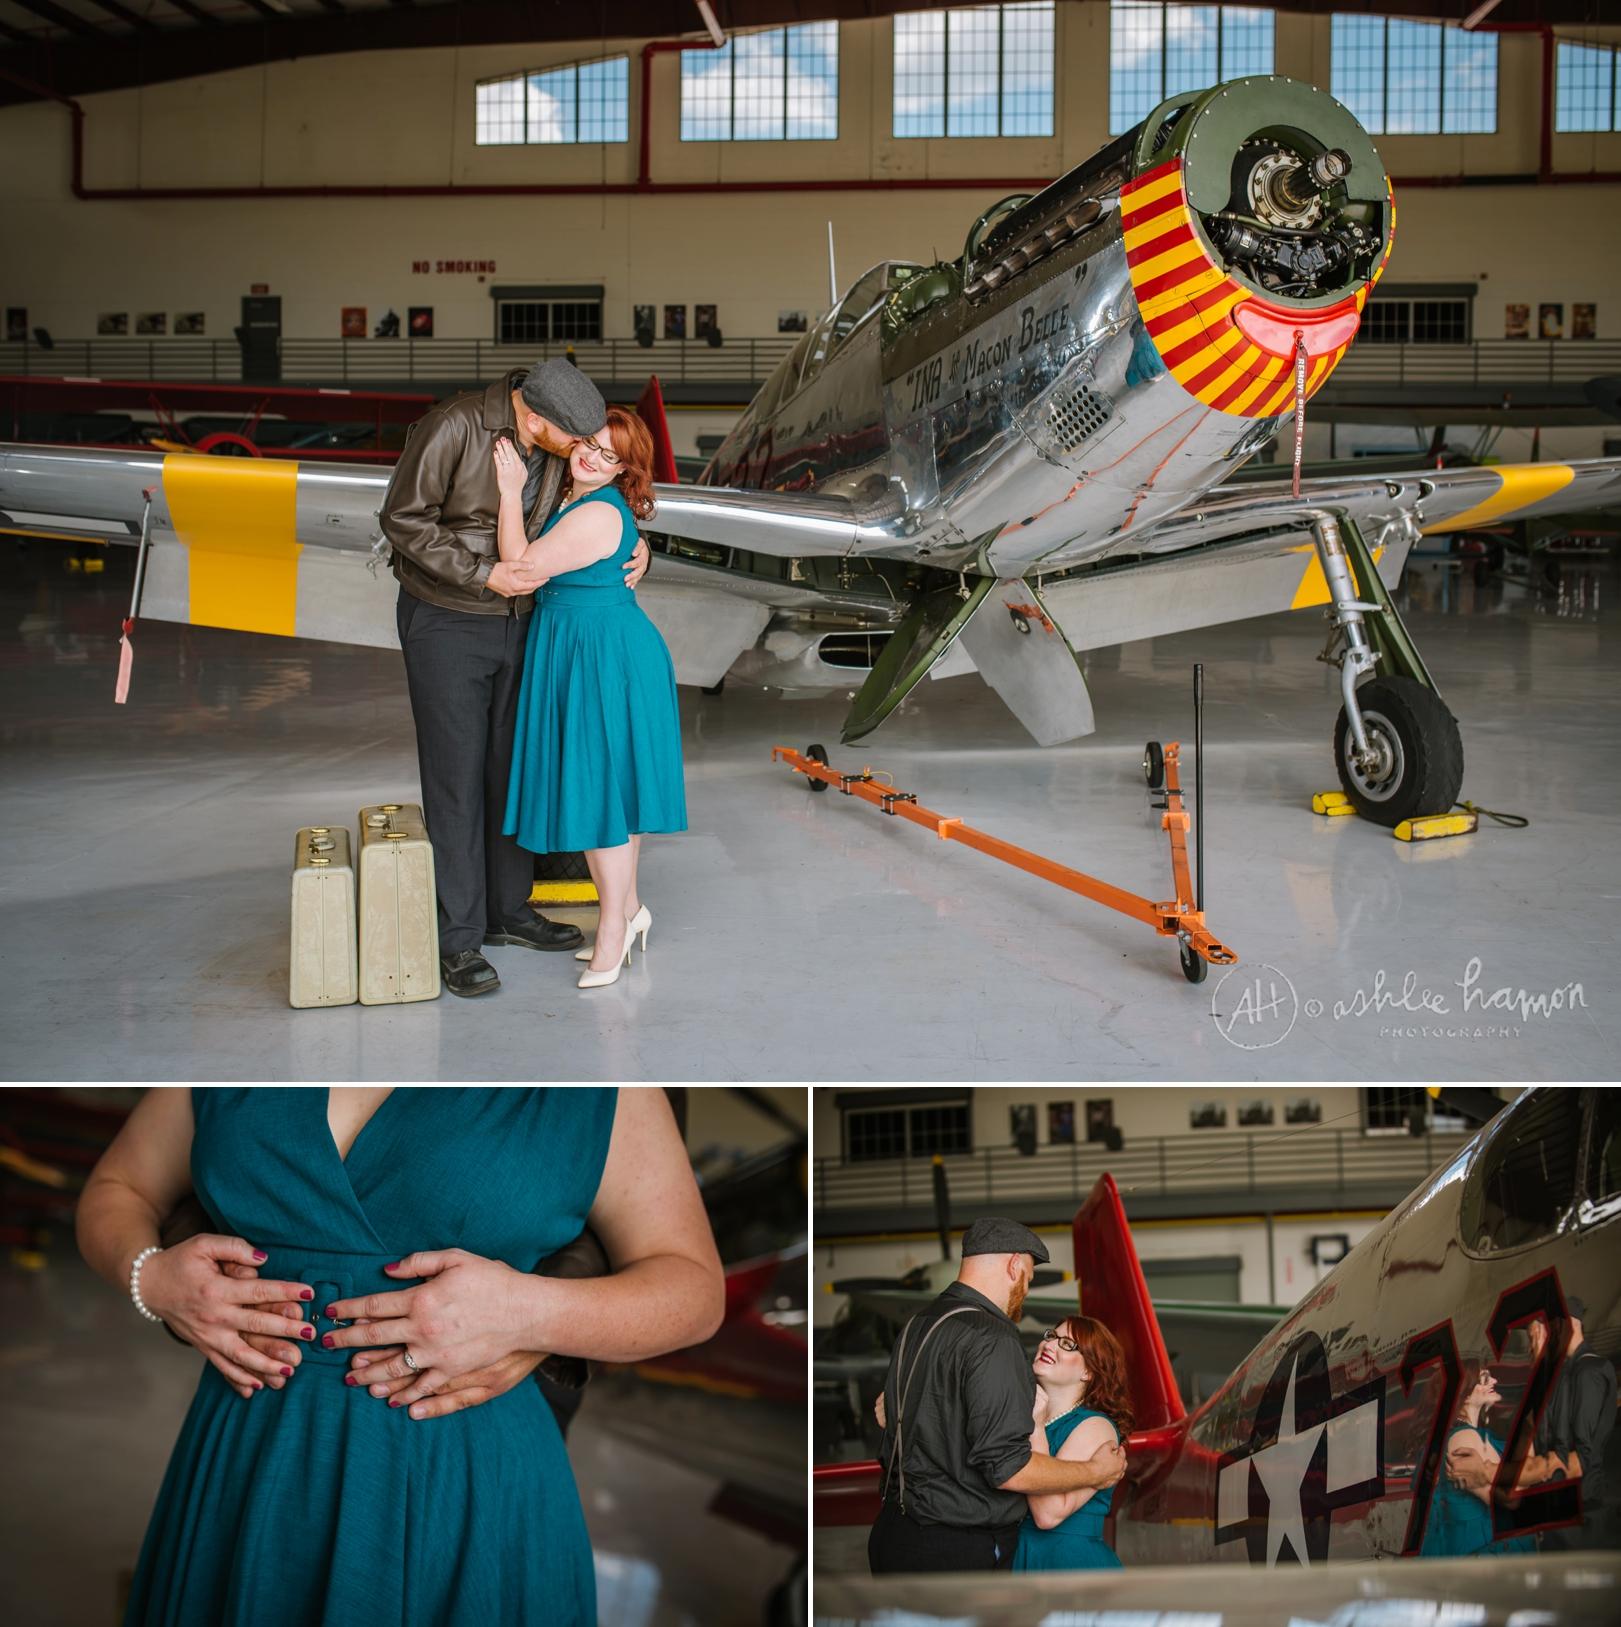 fantasy-of-flight-aviation-themed-engagement-photos-lakeland-florida_0000.jpg